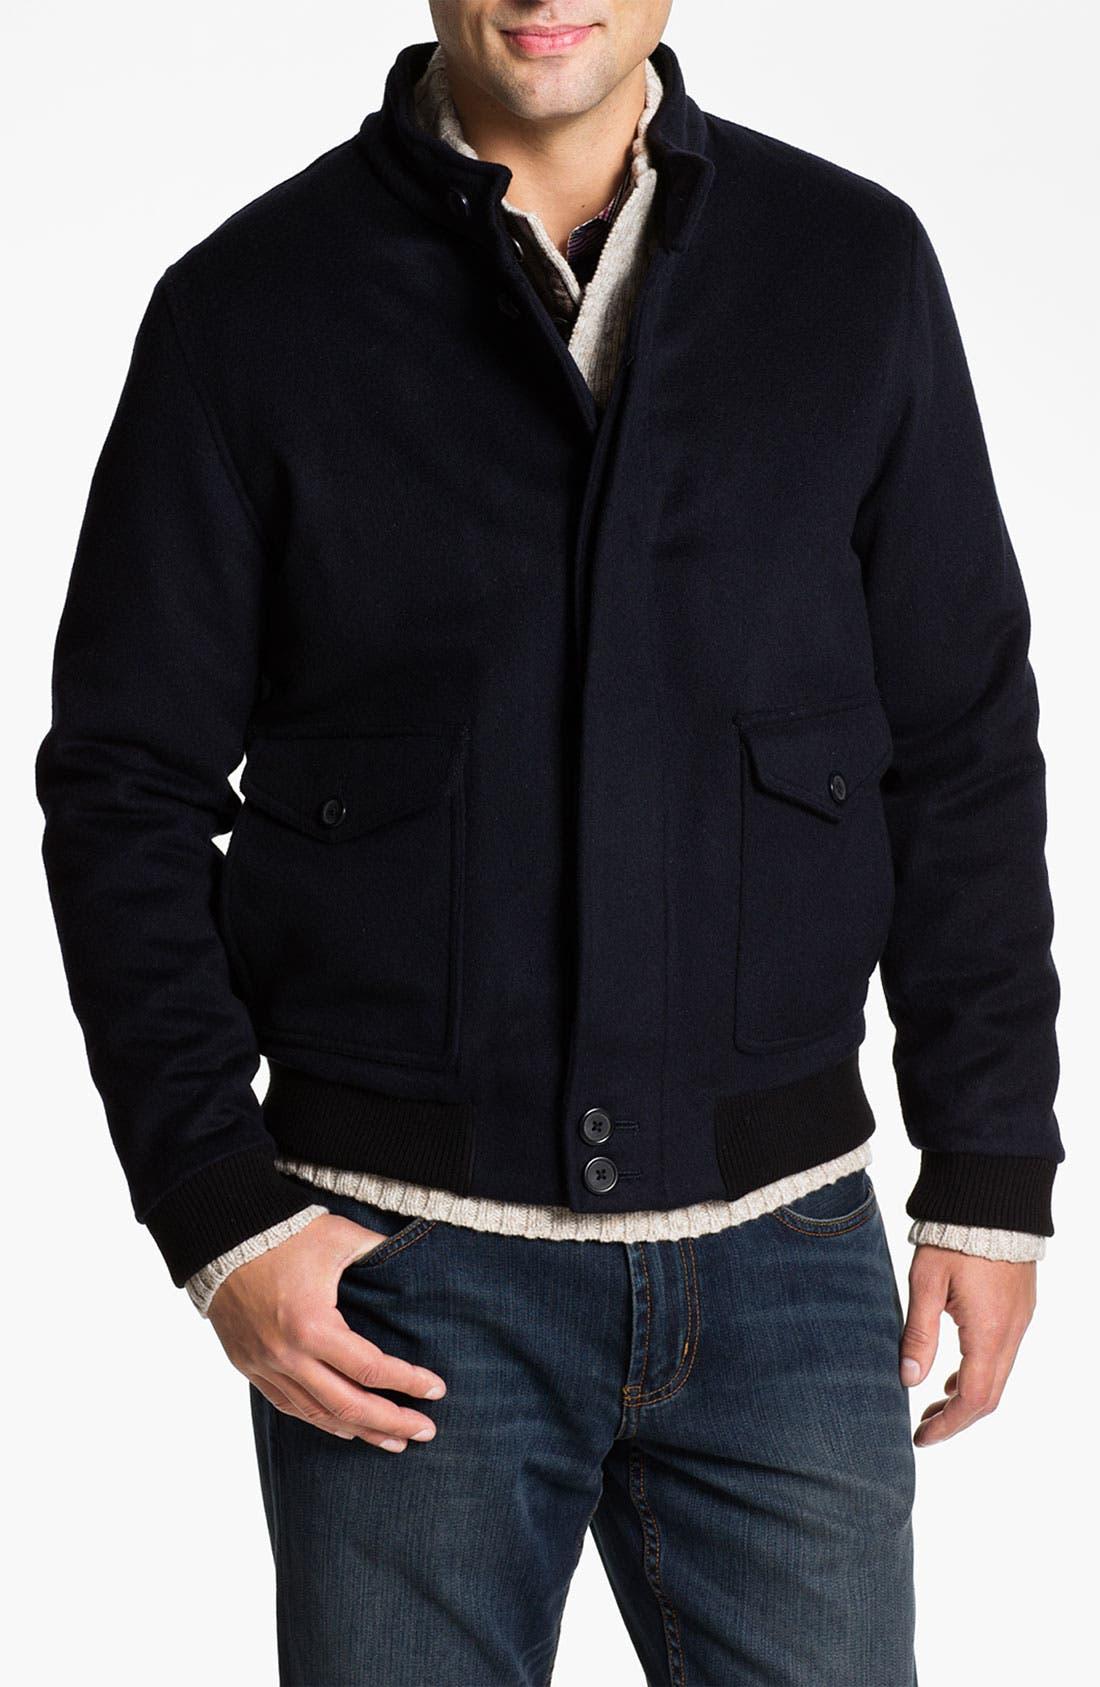 Alternate Image 1 Selected - Hart Schaffner Marx Wool & Cashmere Blouson Jacket